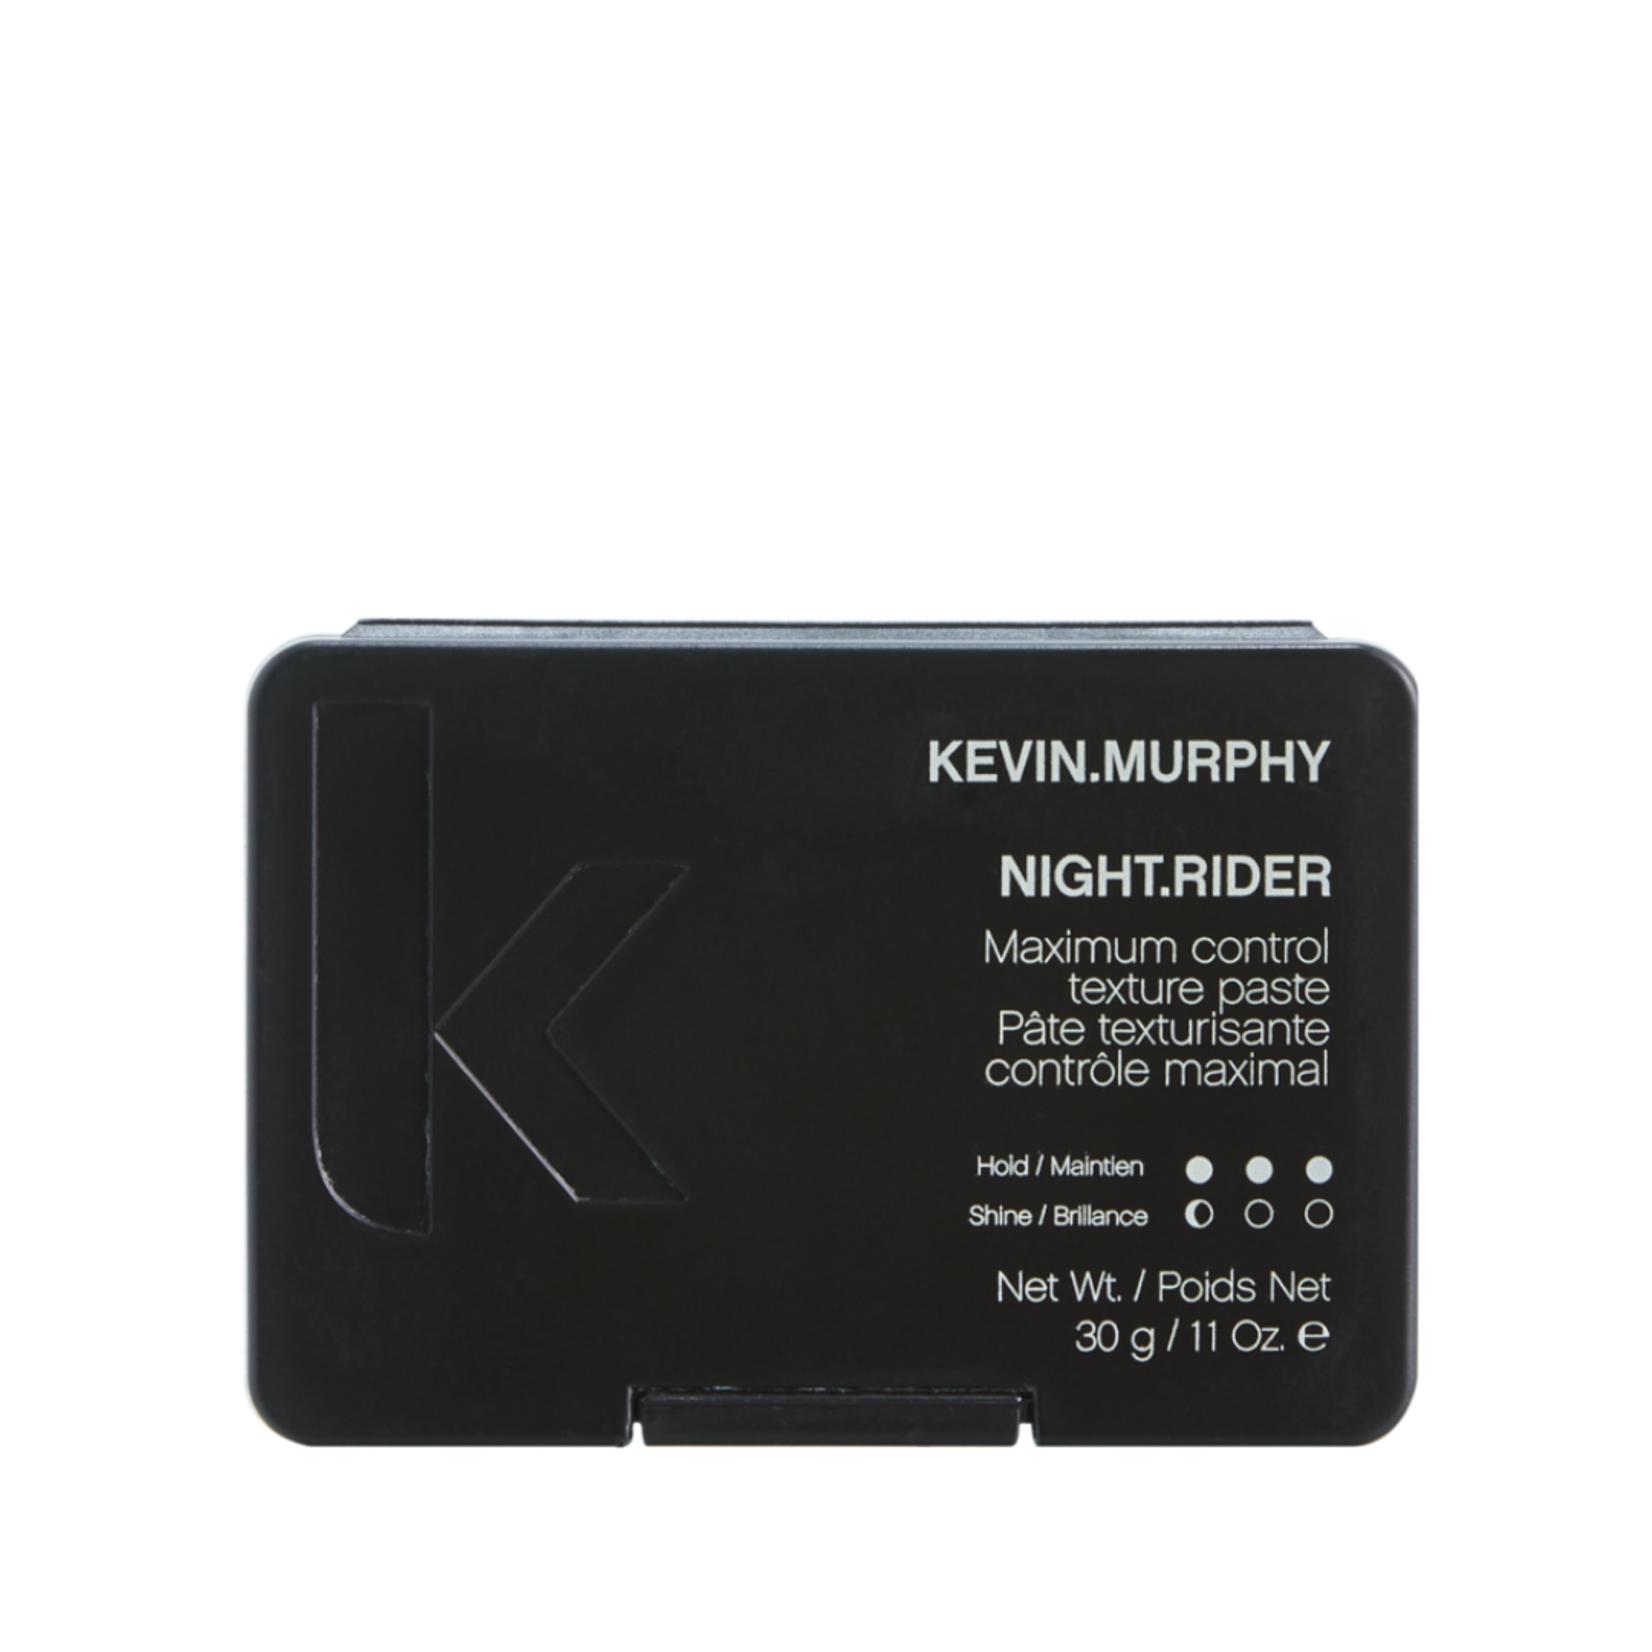 KEVIN.MURPHY KEVIN.MURPHY - NIGHT.RIDER 1.1 oz